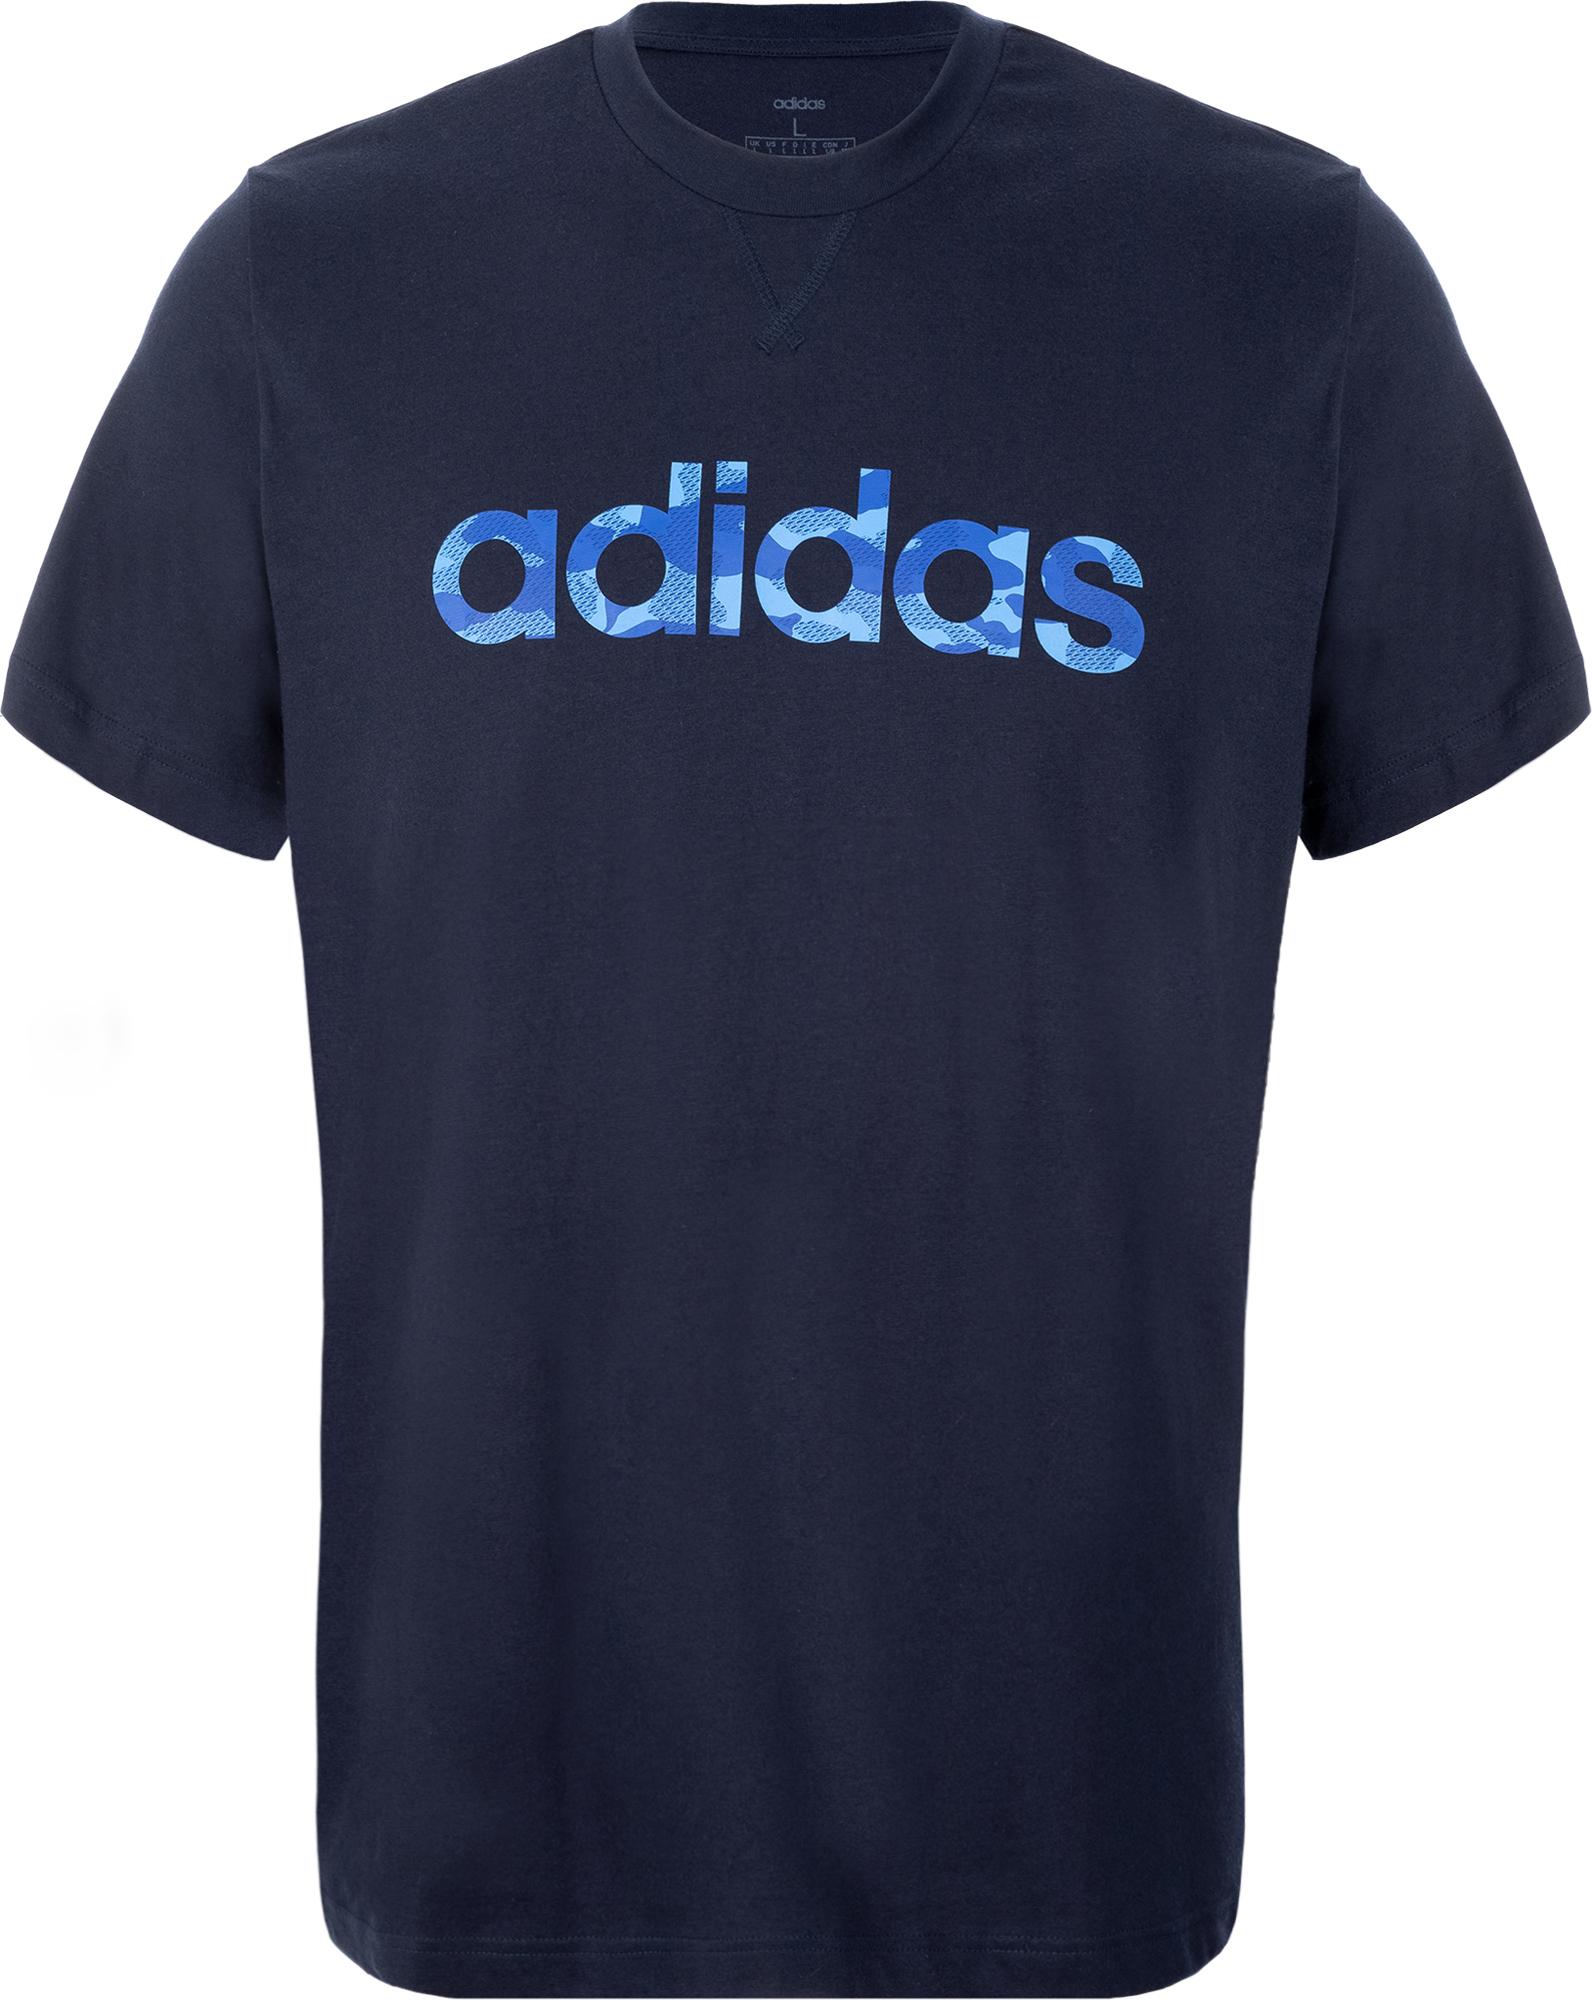 Adidas Футболка мужская Camo Linear, размер 52